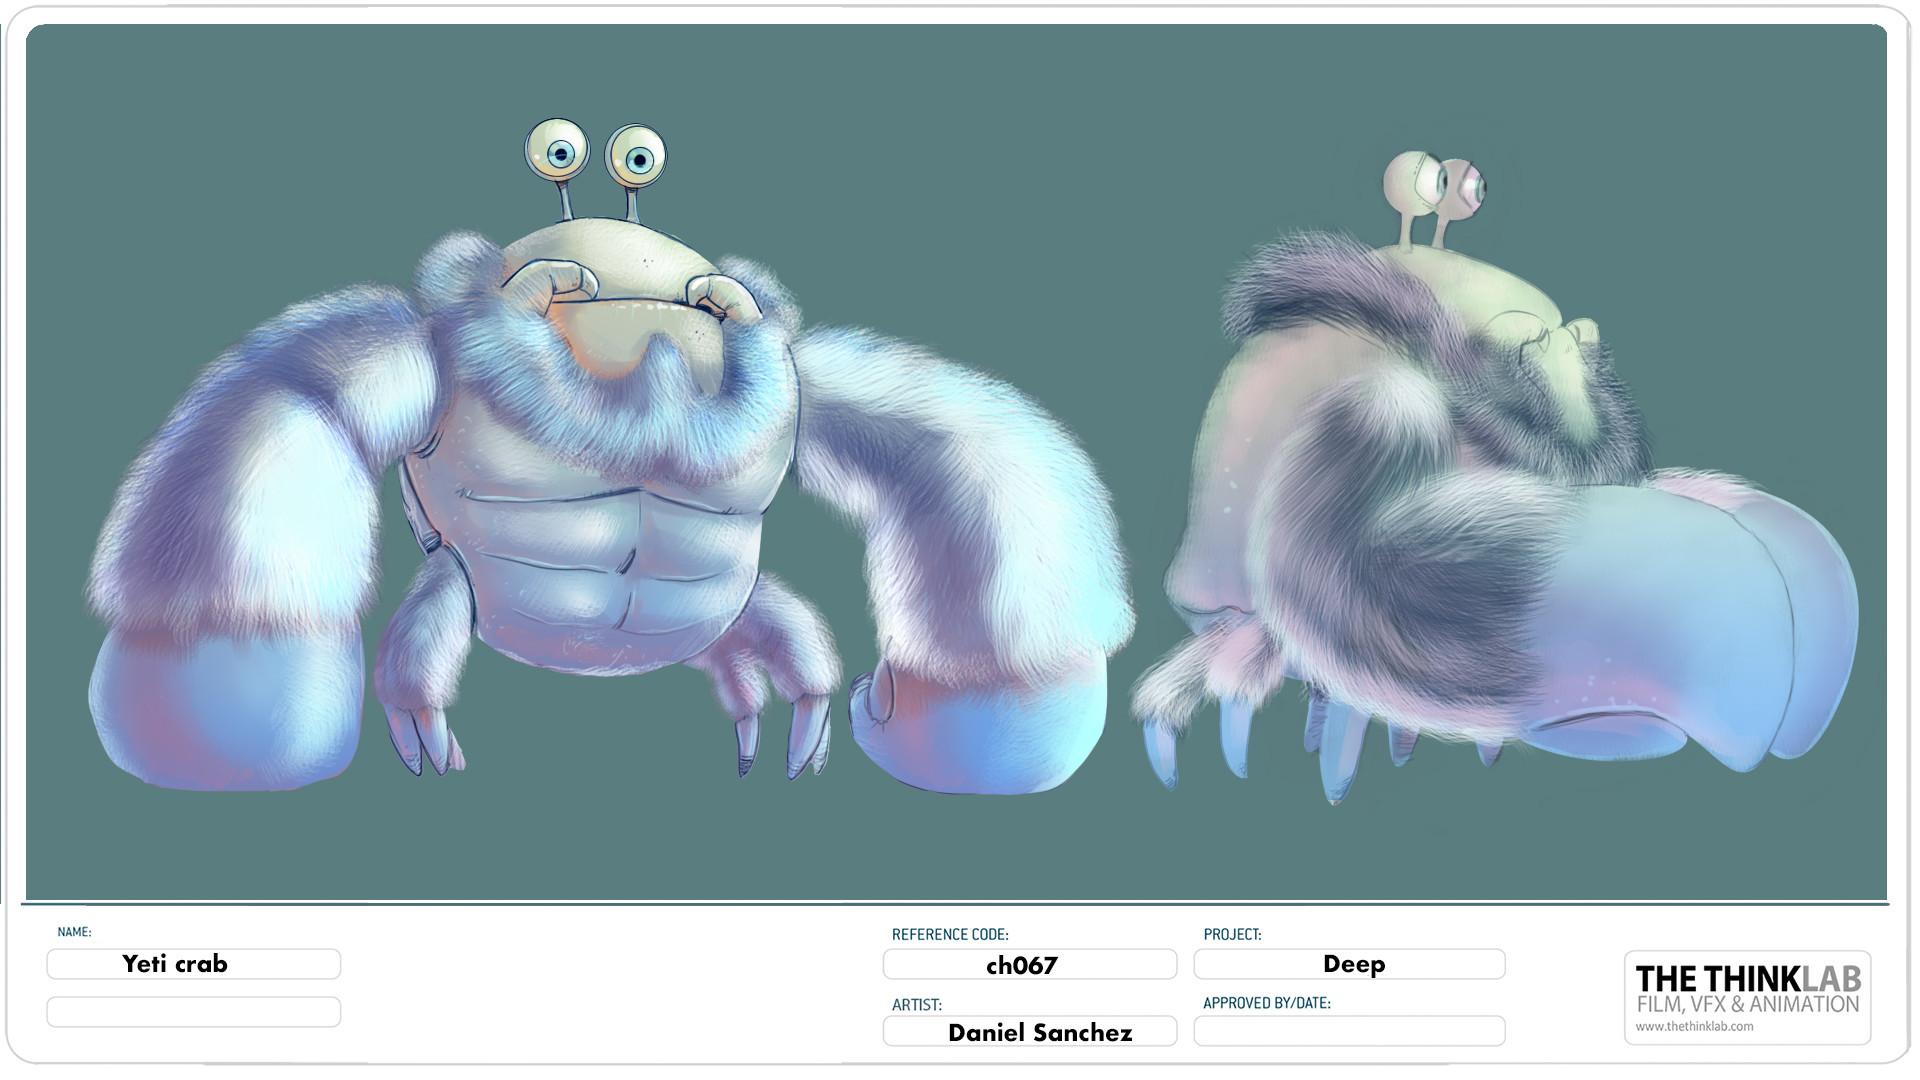 daniel sanchez deep animated movie 2017